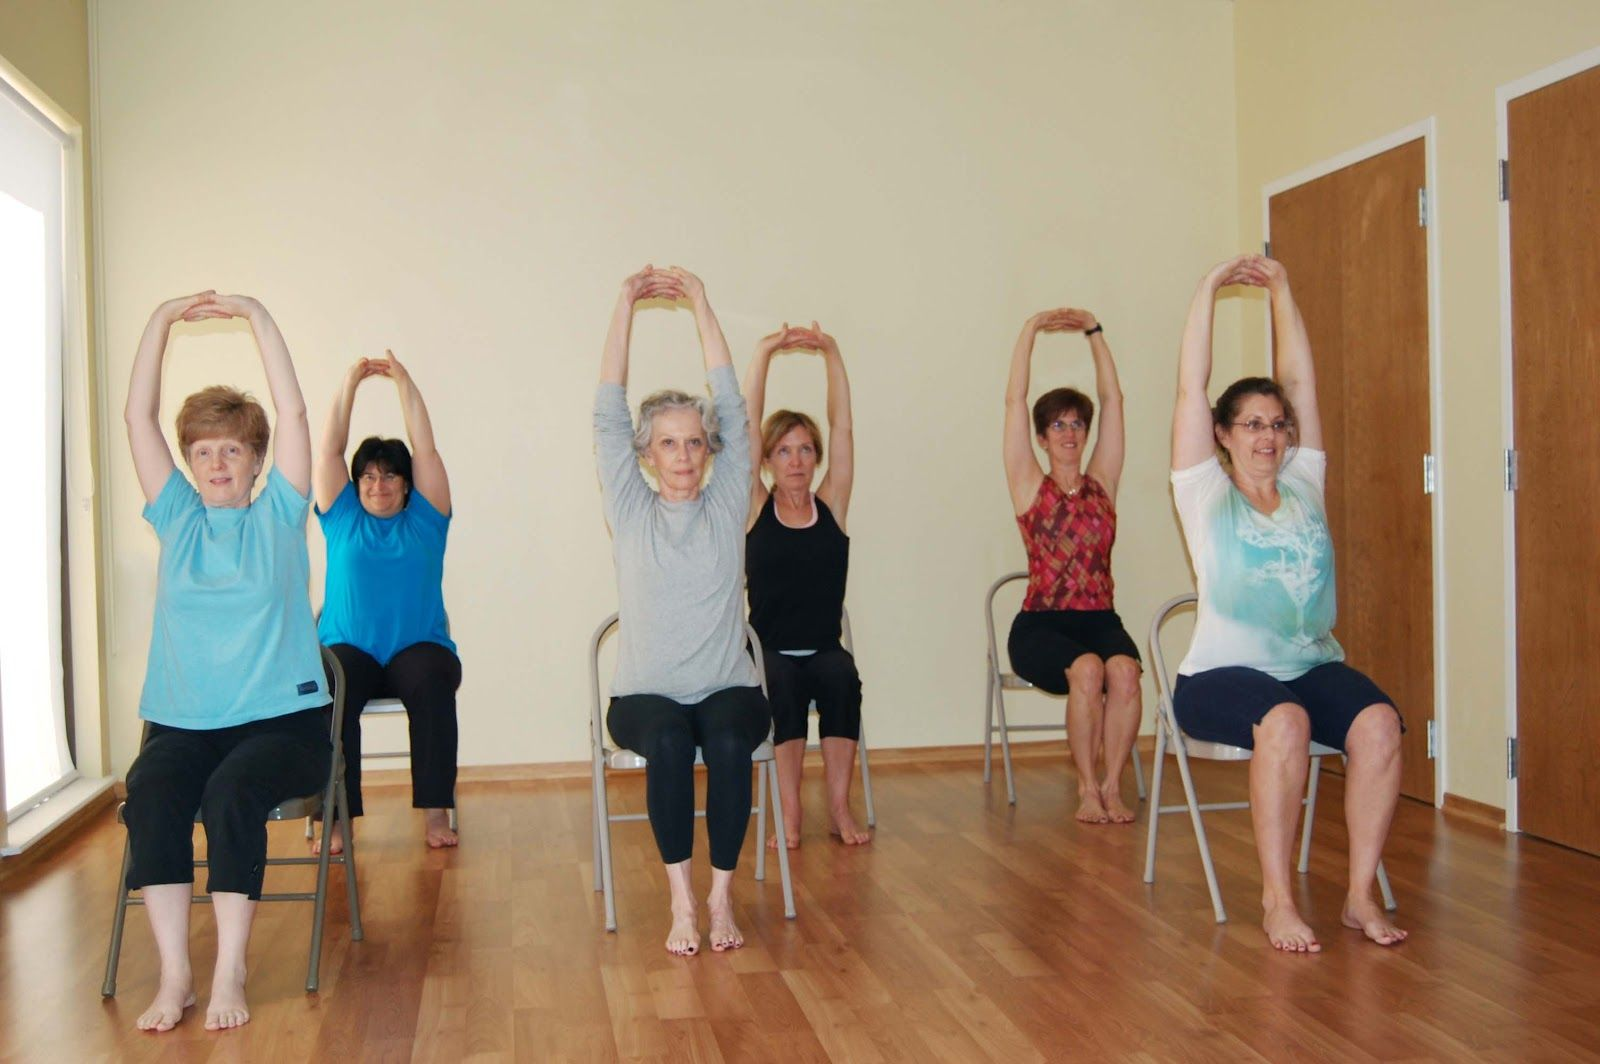 Yoga For Heart Health Yoga for seniors, Chair pose yoga